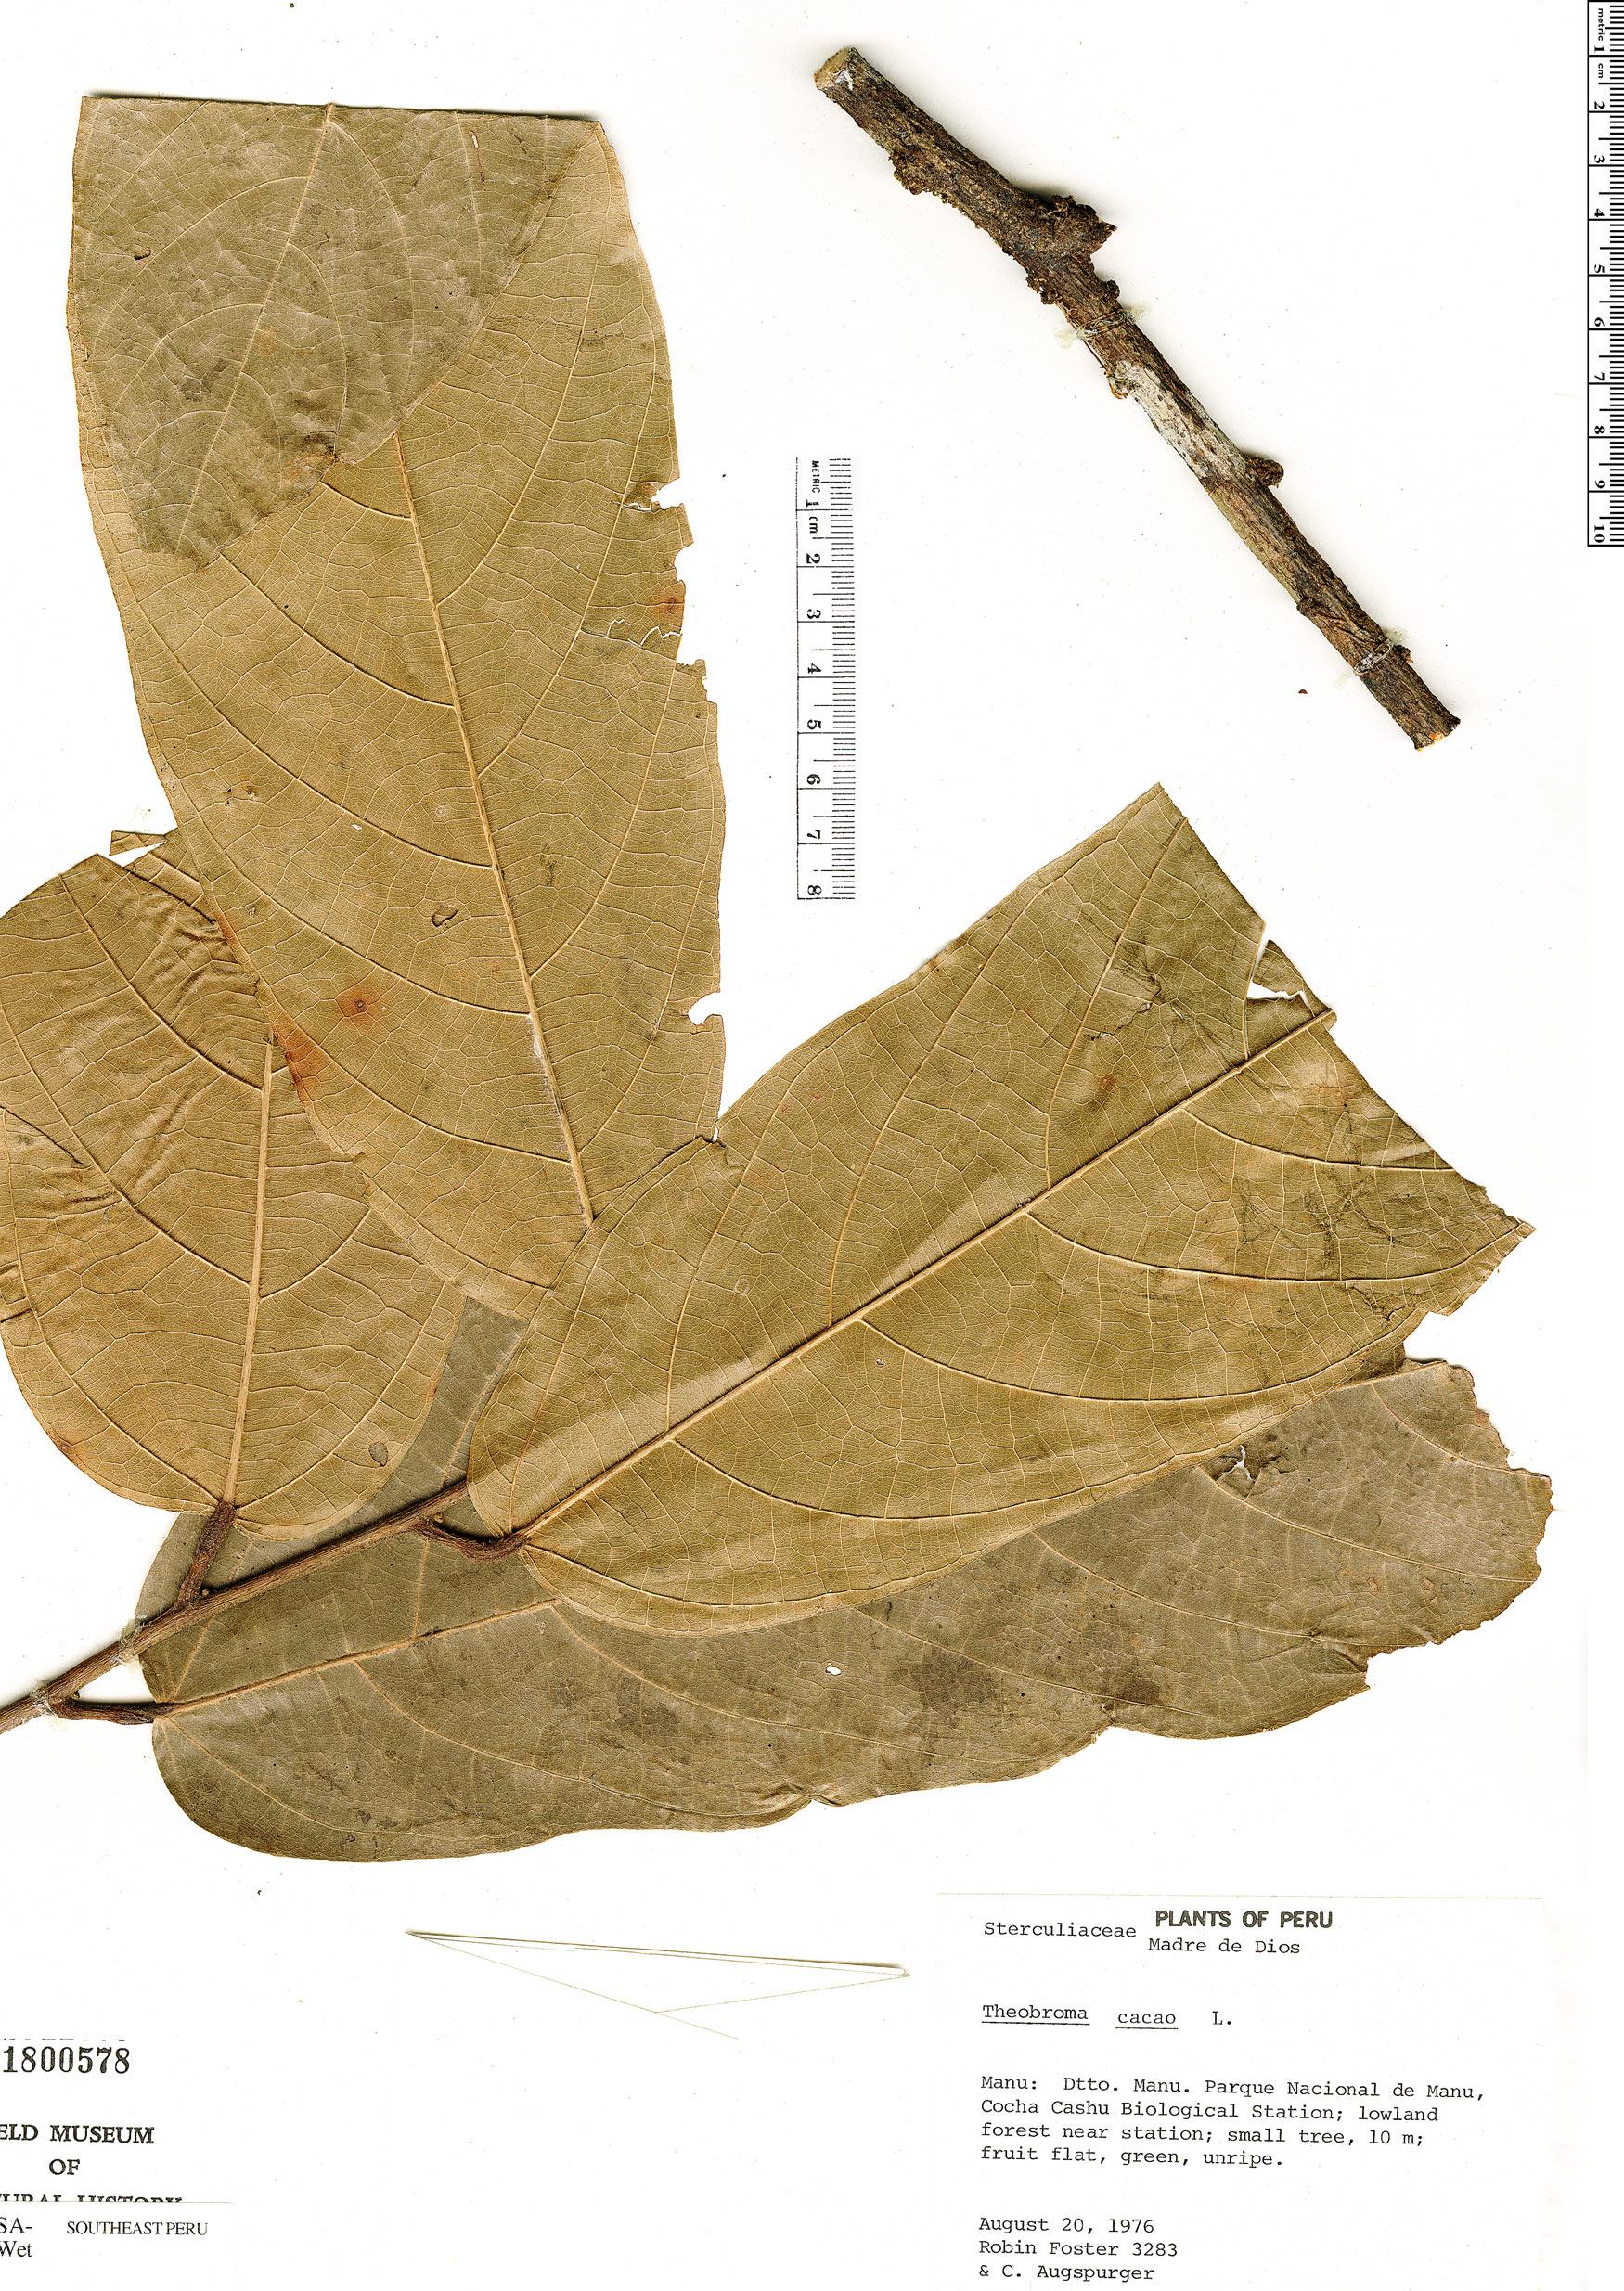 Specimen: Theobroma cacao